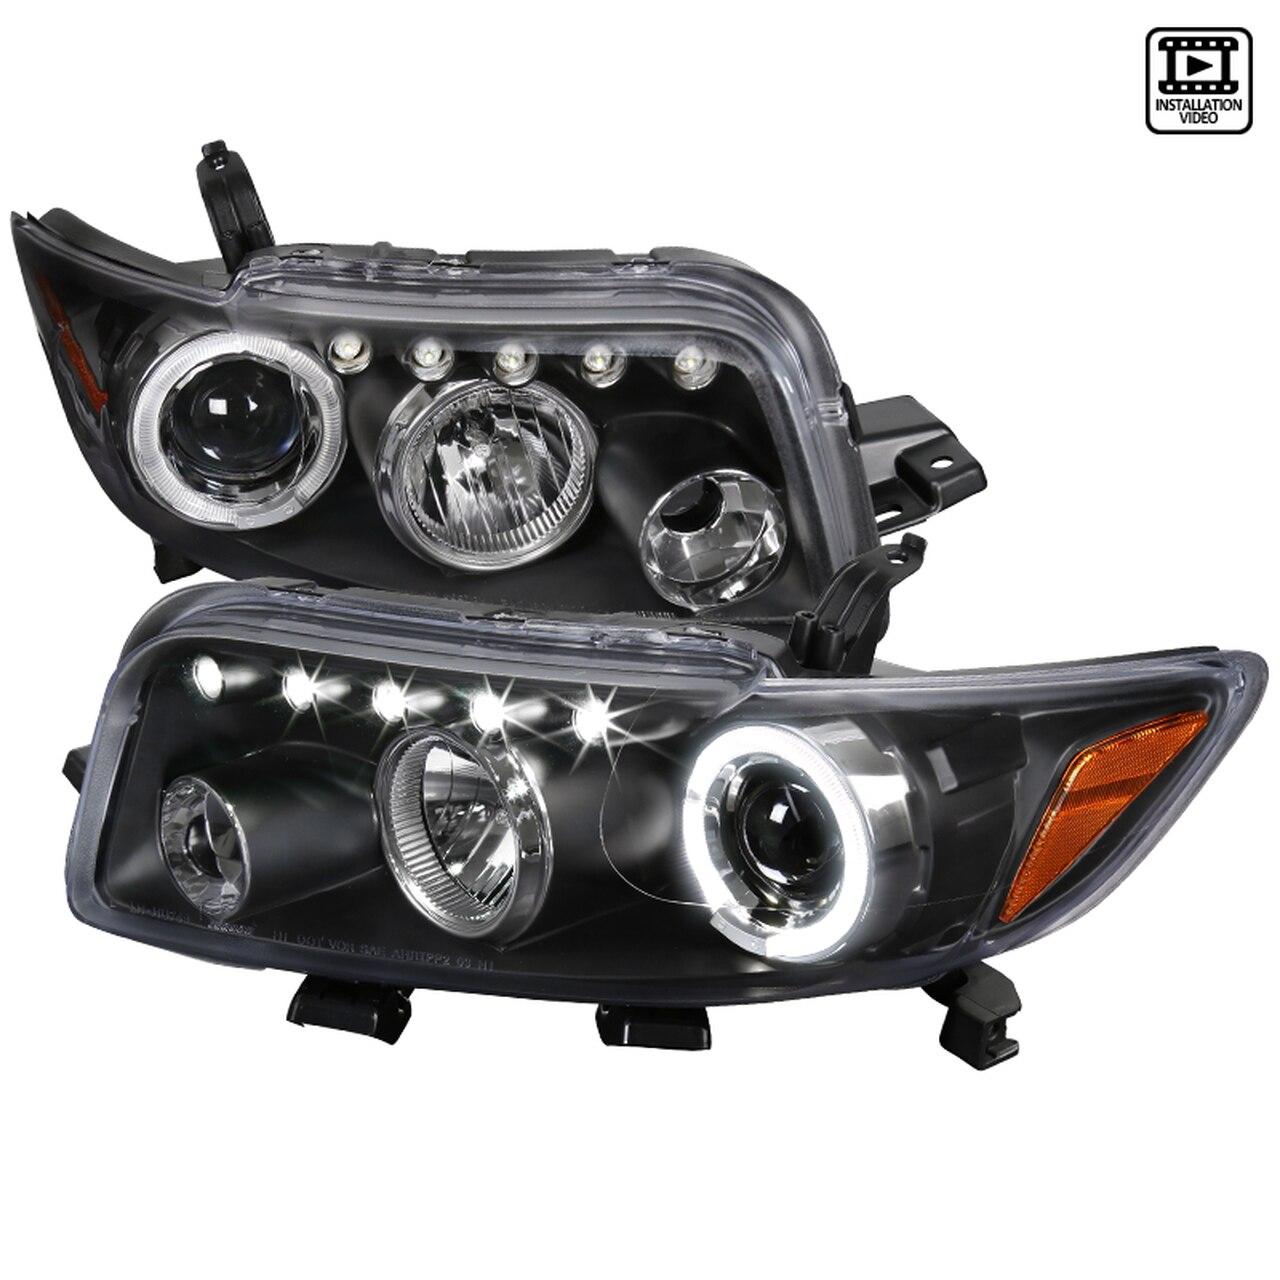 2008-2010 Scion XB Single Halo LED Projector Headlights (Matte Black Housing/Clear Lens)